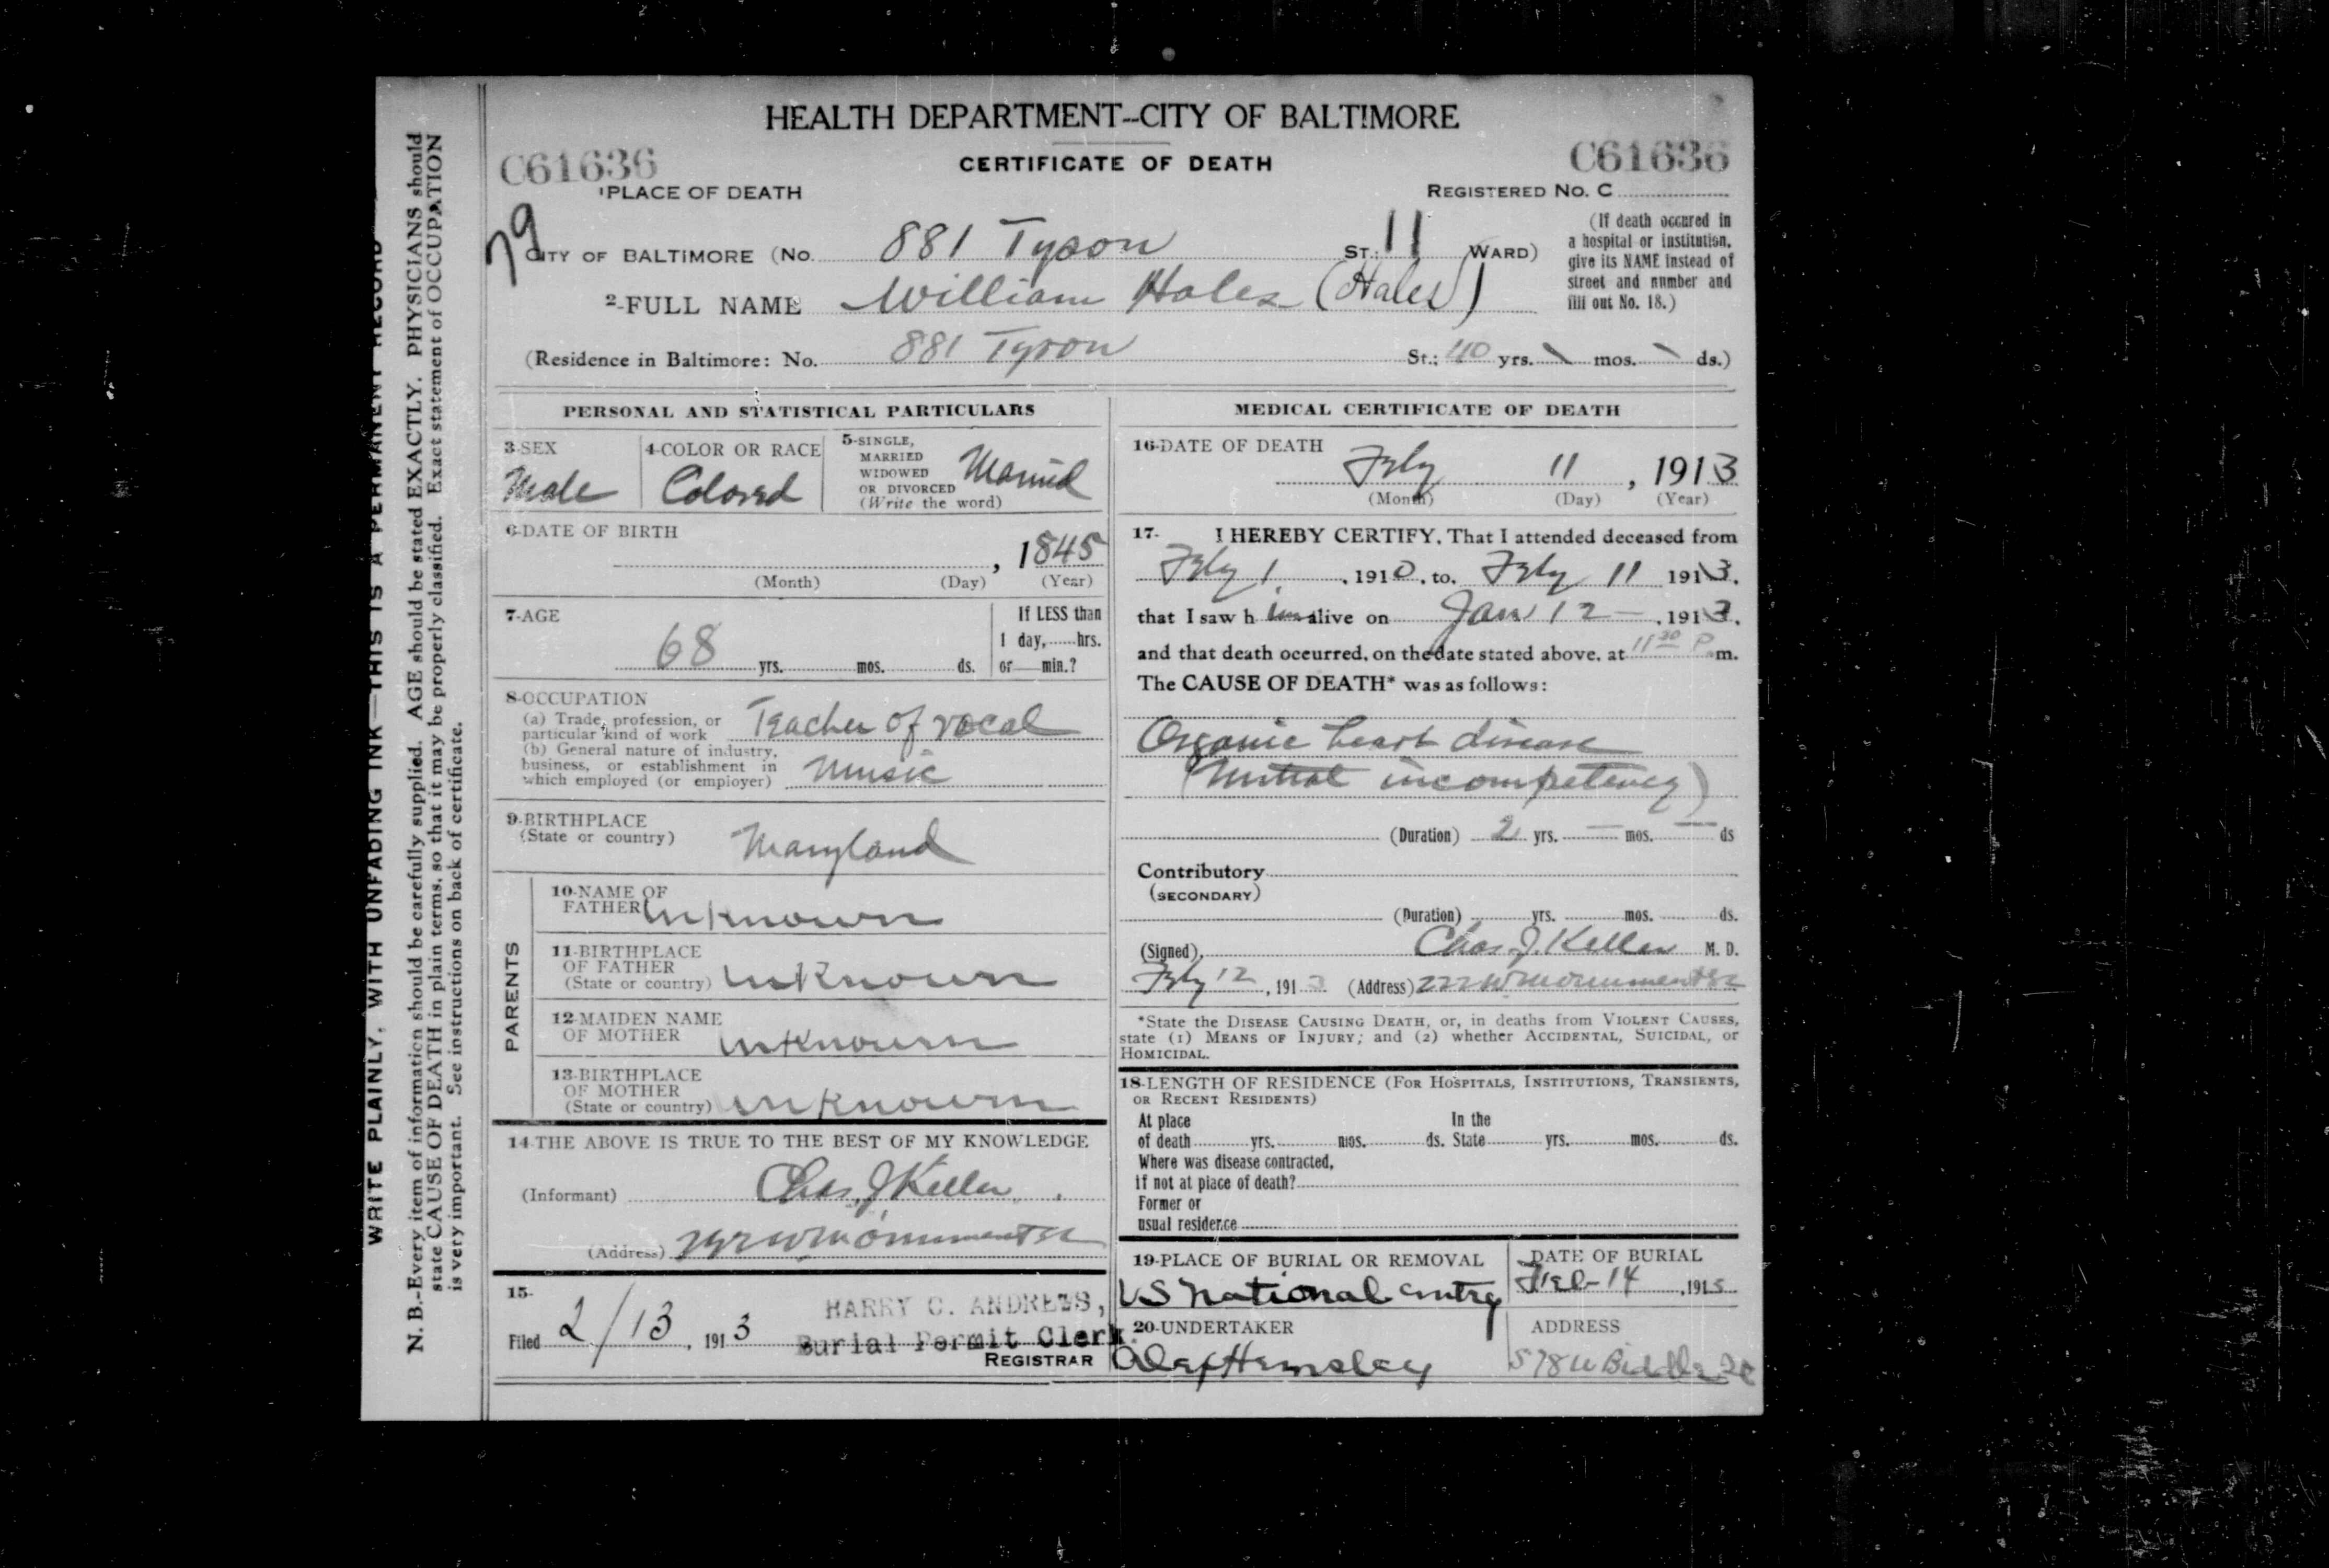 William hales msa sc 5496 51313 baltimore city health department bureau of vital statistics death record dates 021913 051913 william hales msa cm1132 115 aiddatafo Gallery